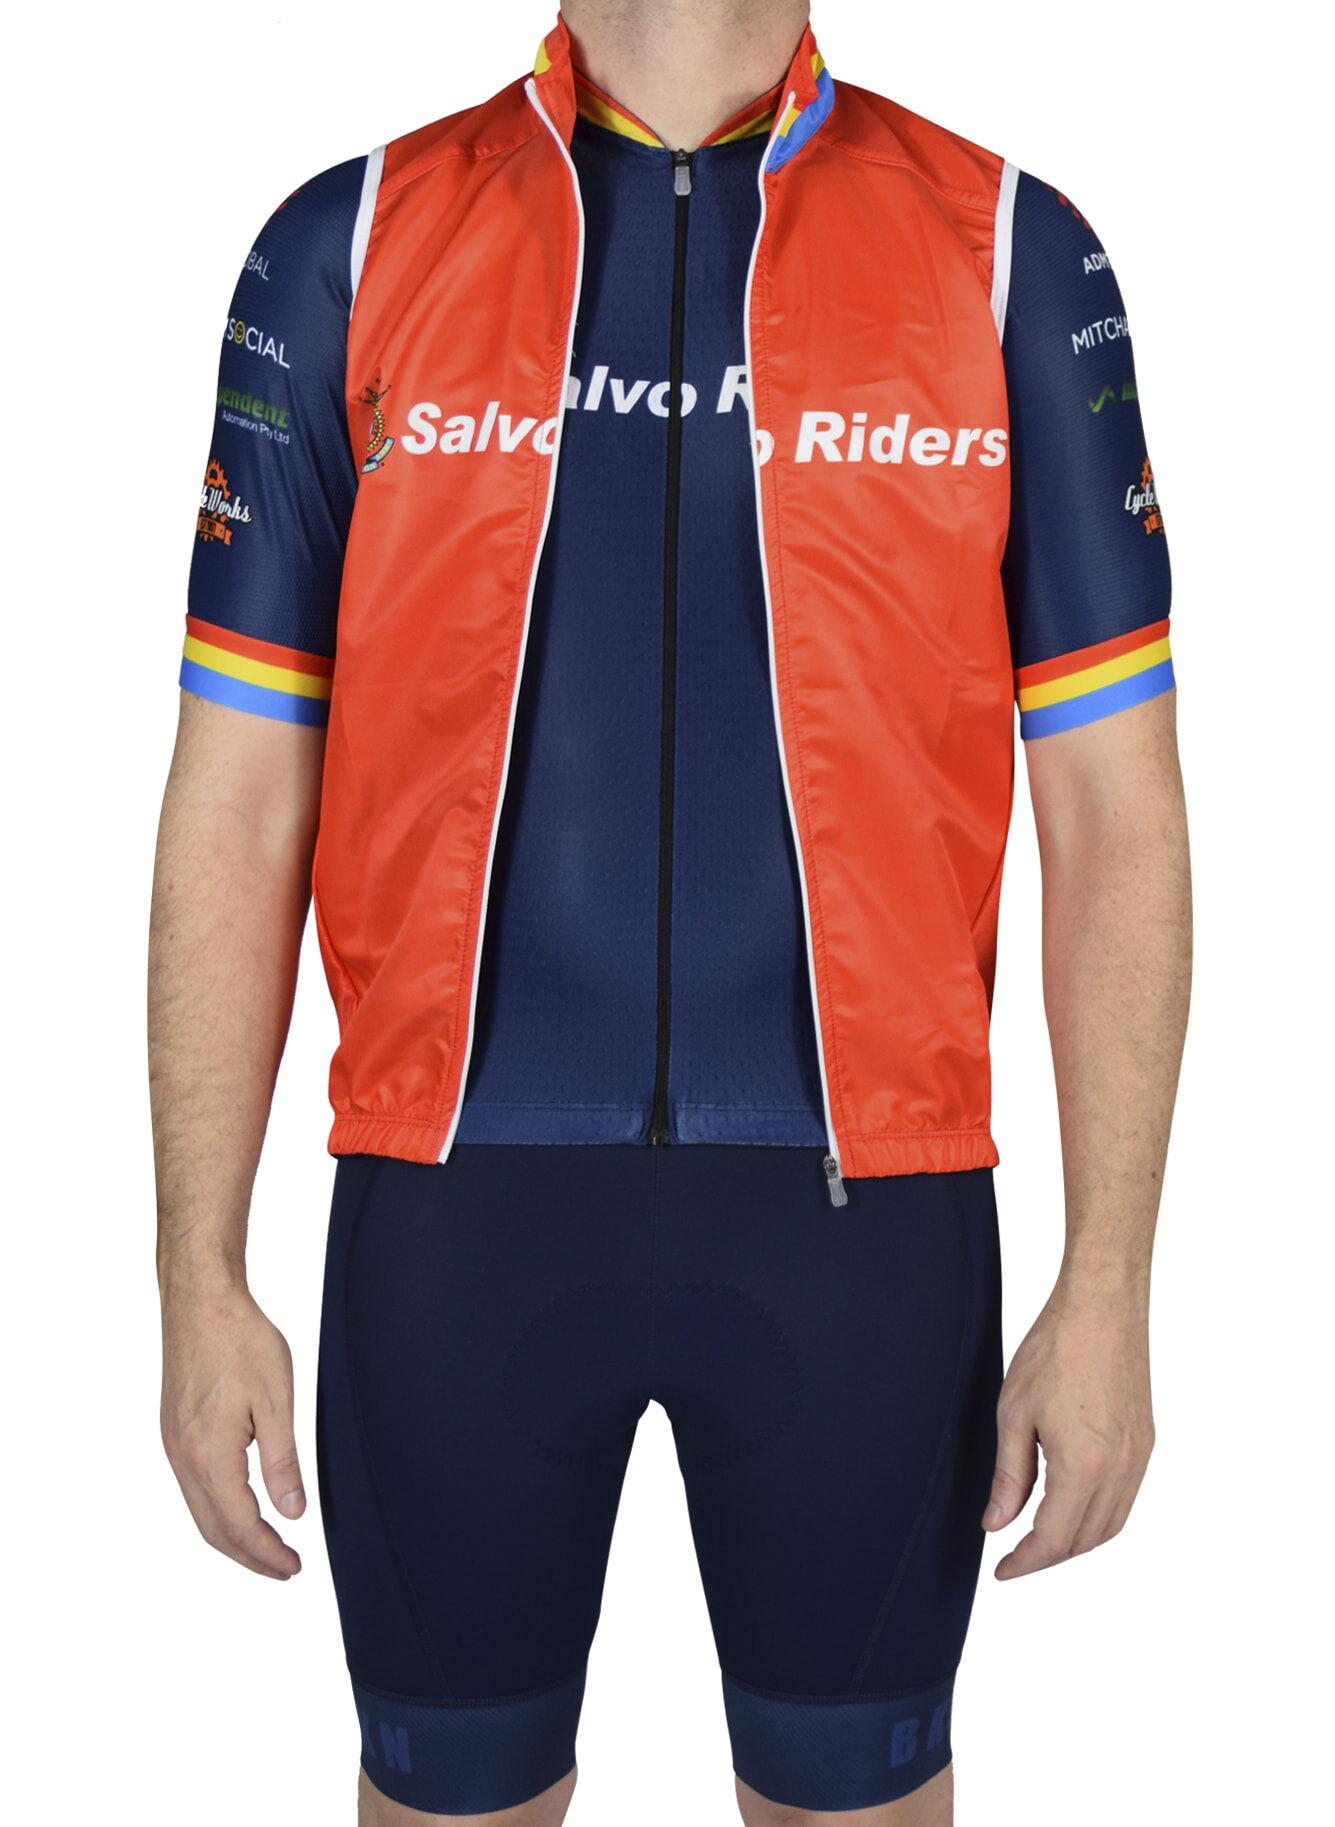 Salvo Riders Pro Vest open